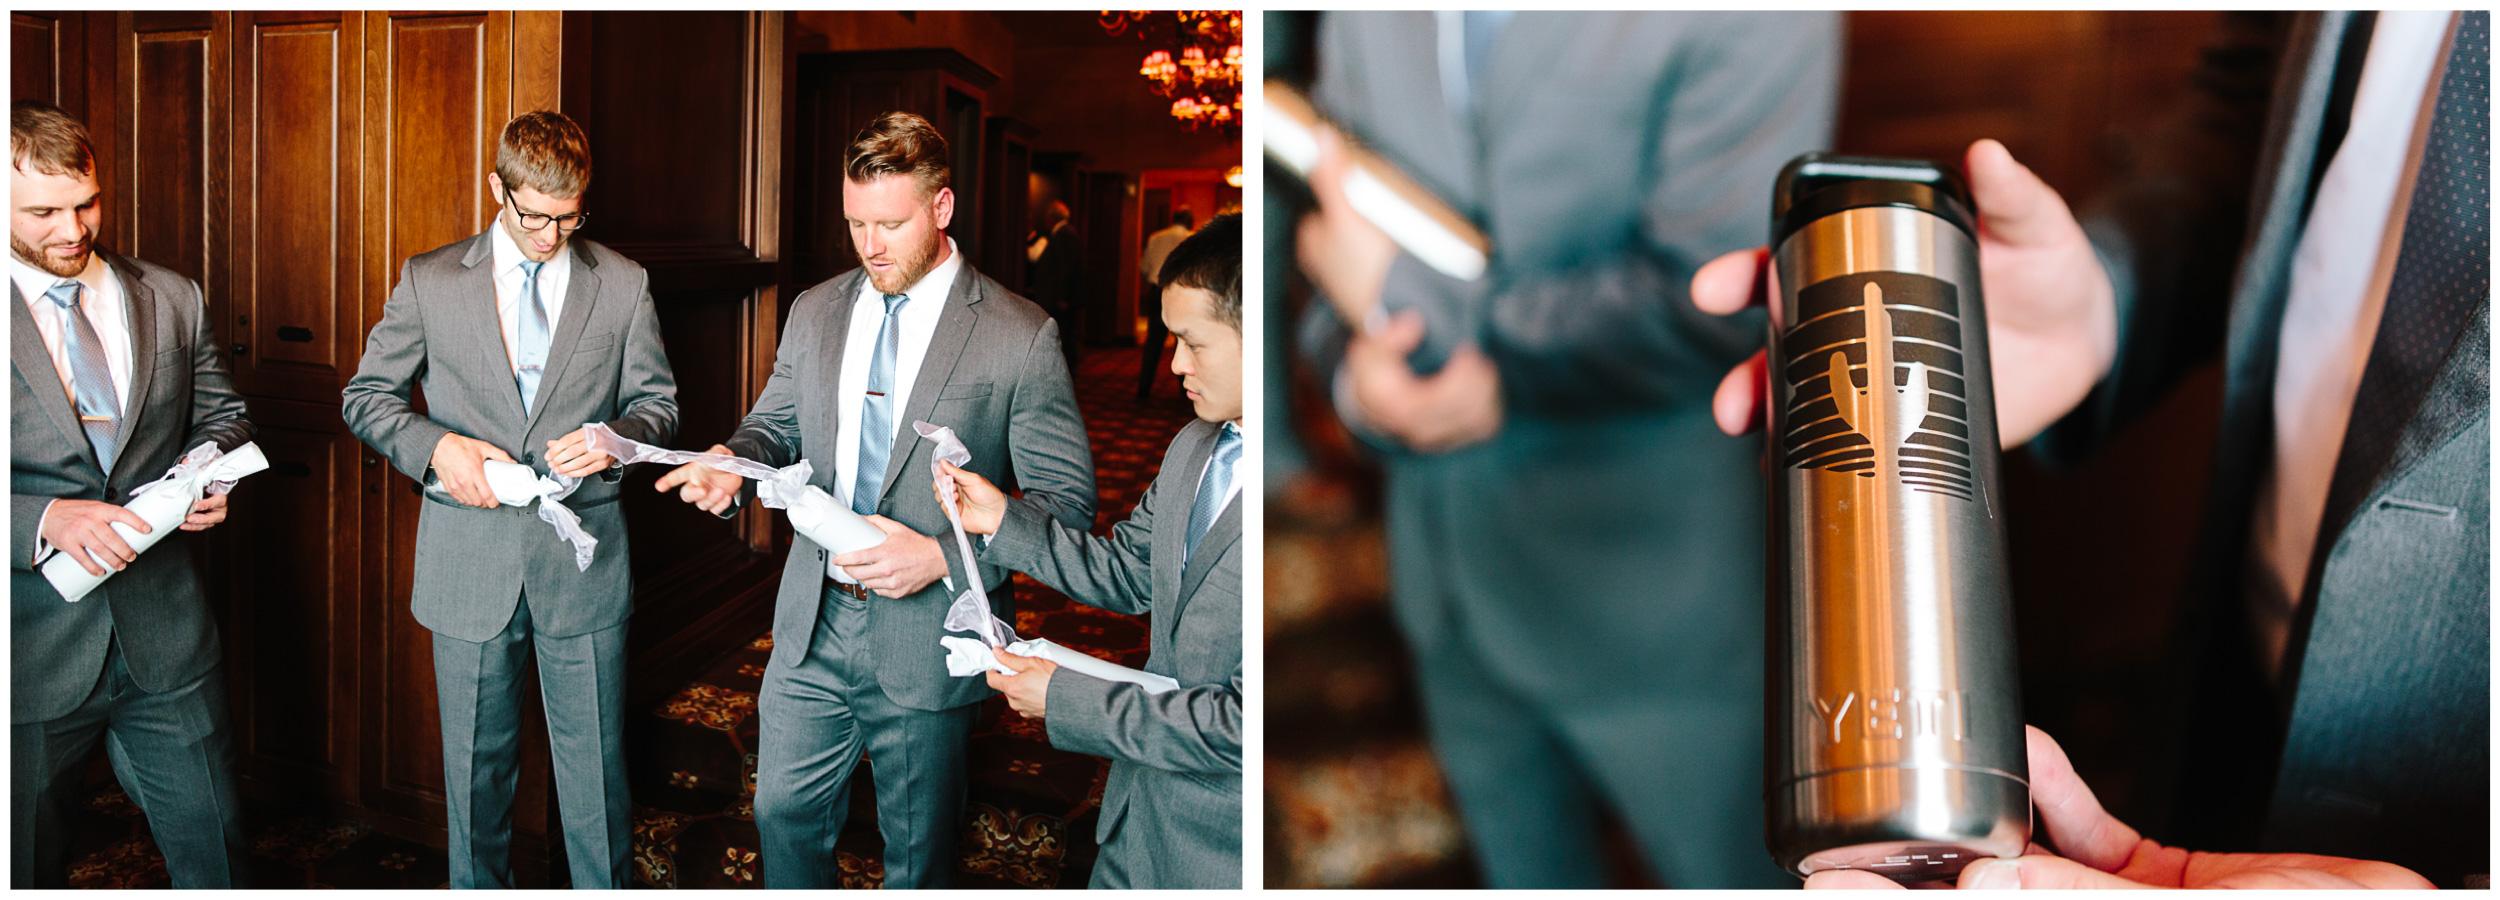 bella_collina_wedding_21.jpg